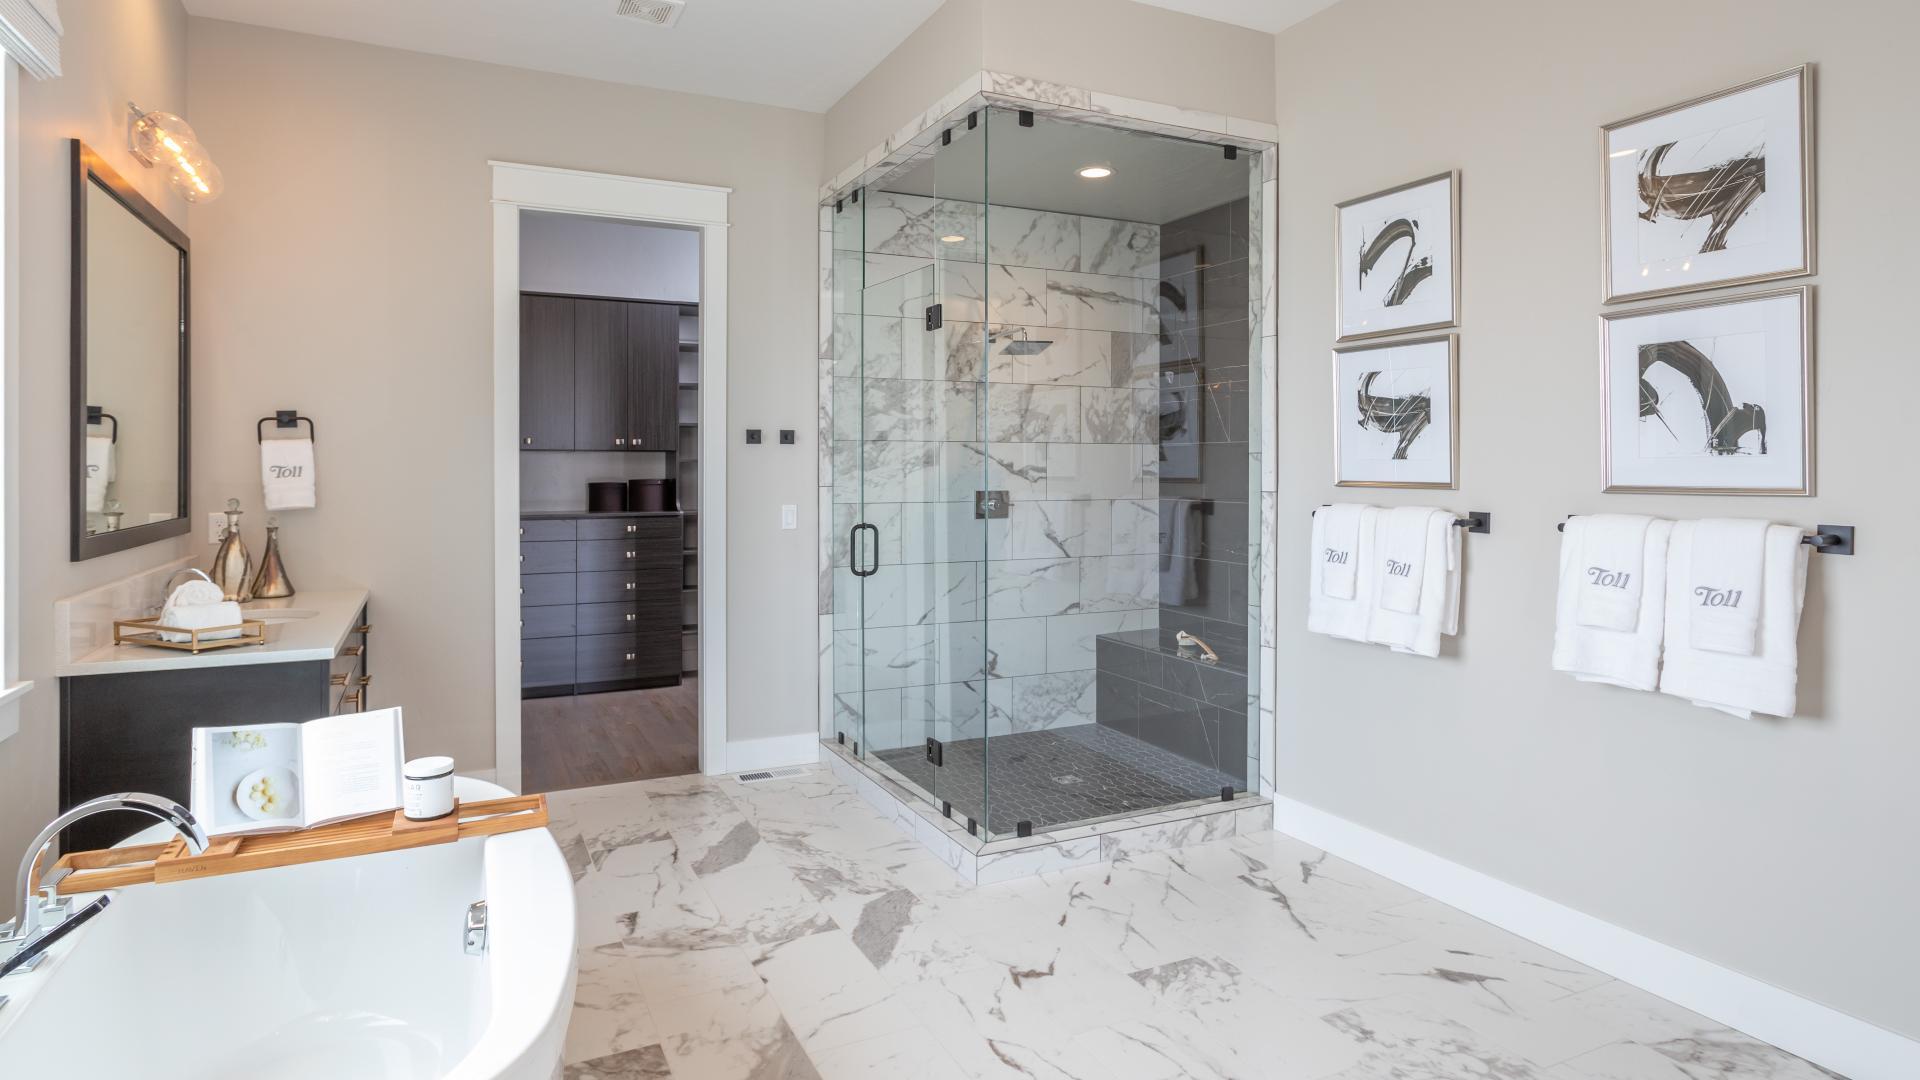 Luxurious spa-like primary bathrooms